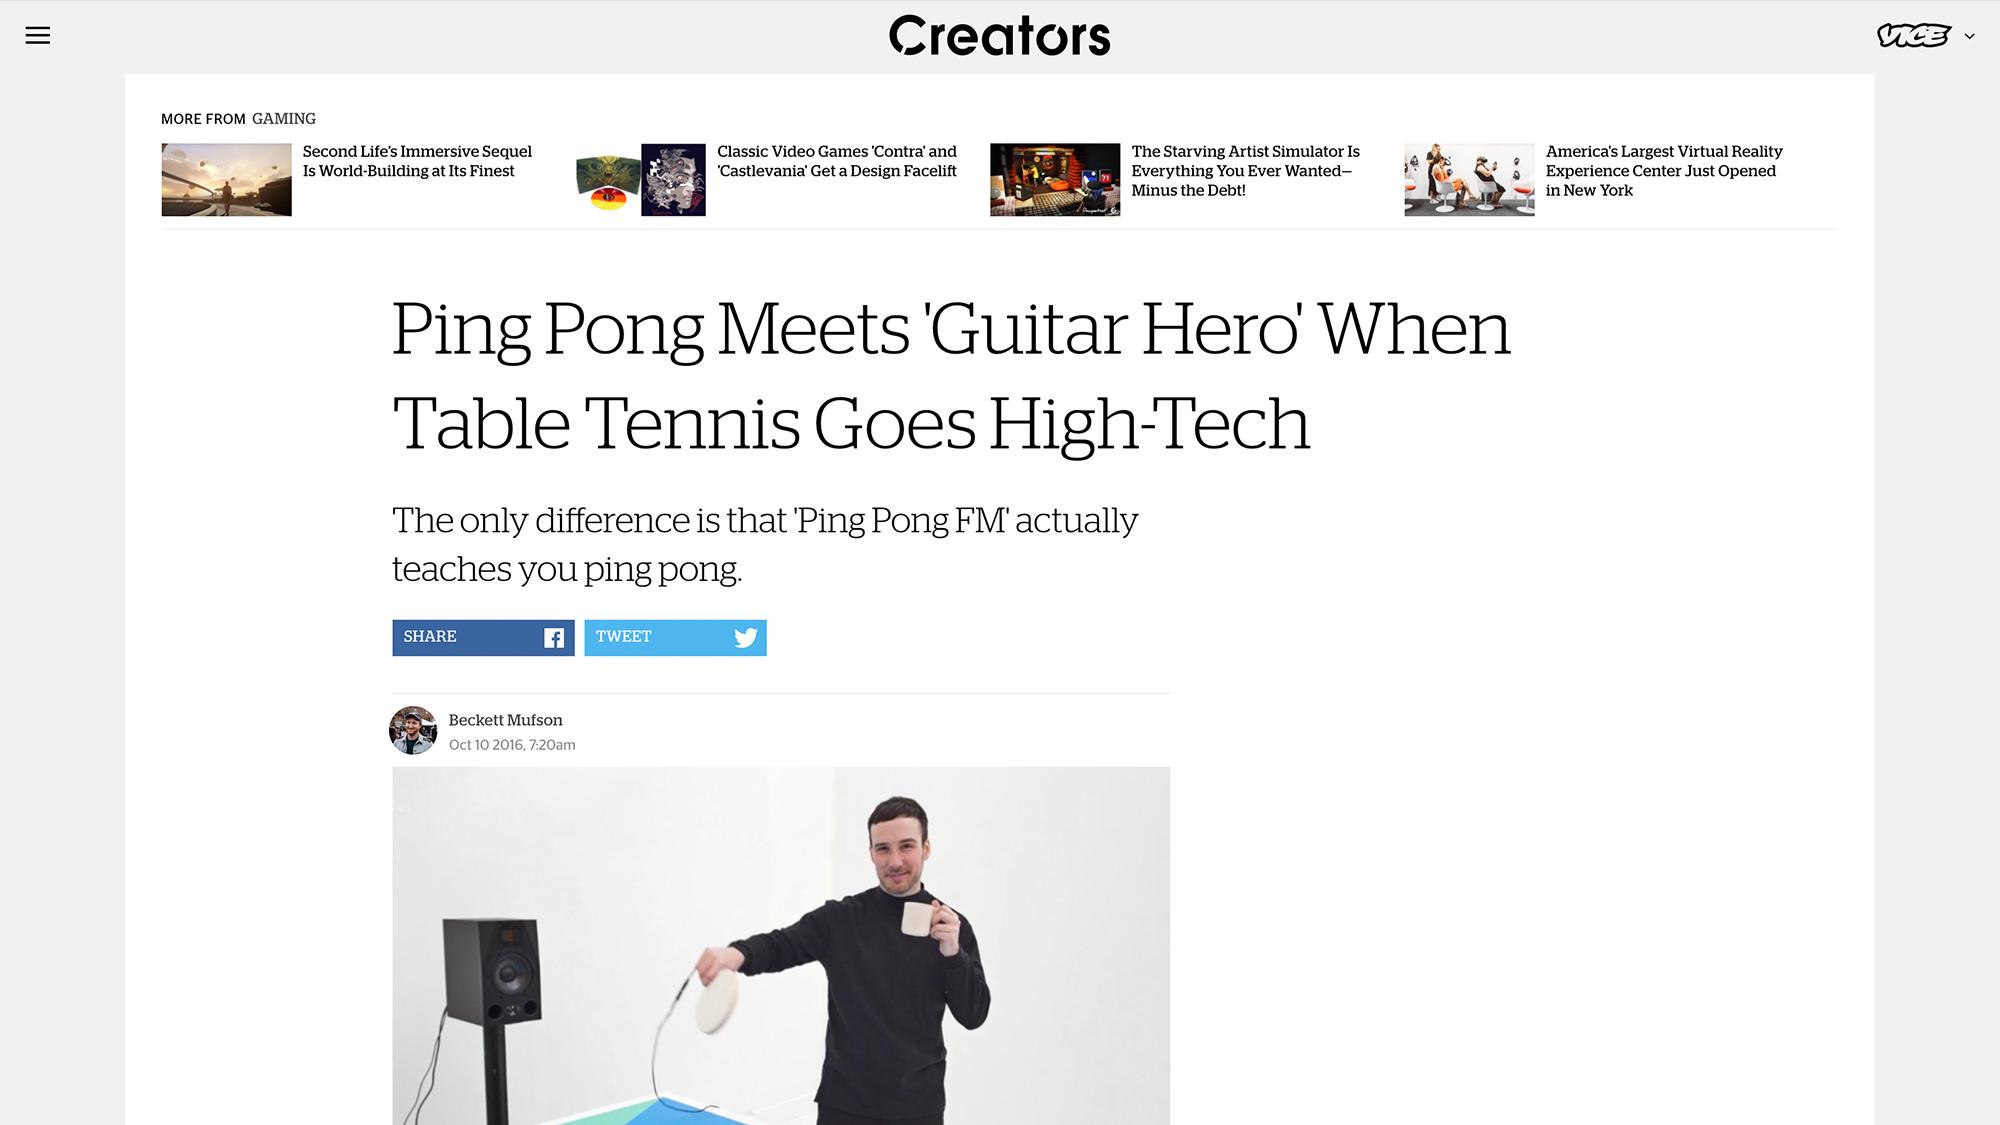 PingPongFM_Press_Creators-Project.jpg